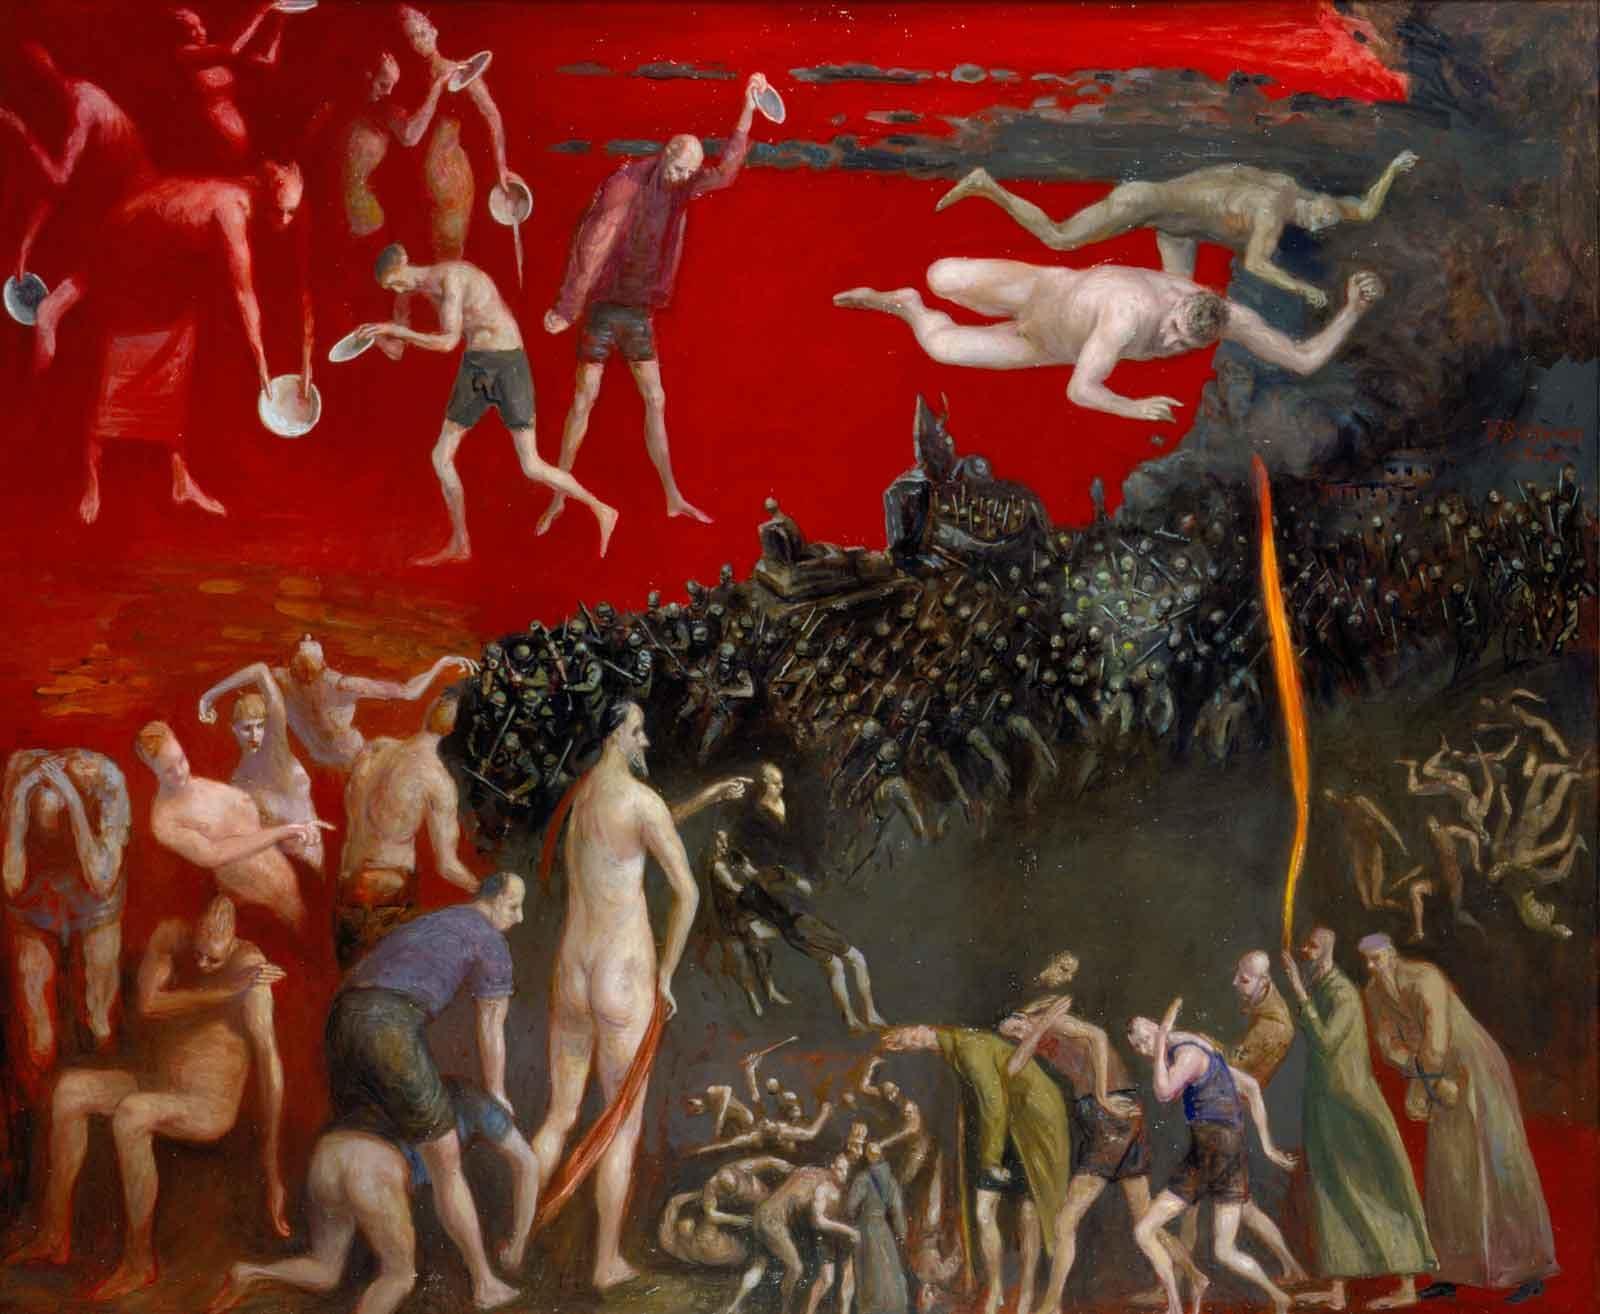 Volker Stelzmann: Seven Bowls of Wrath